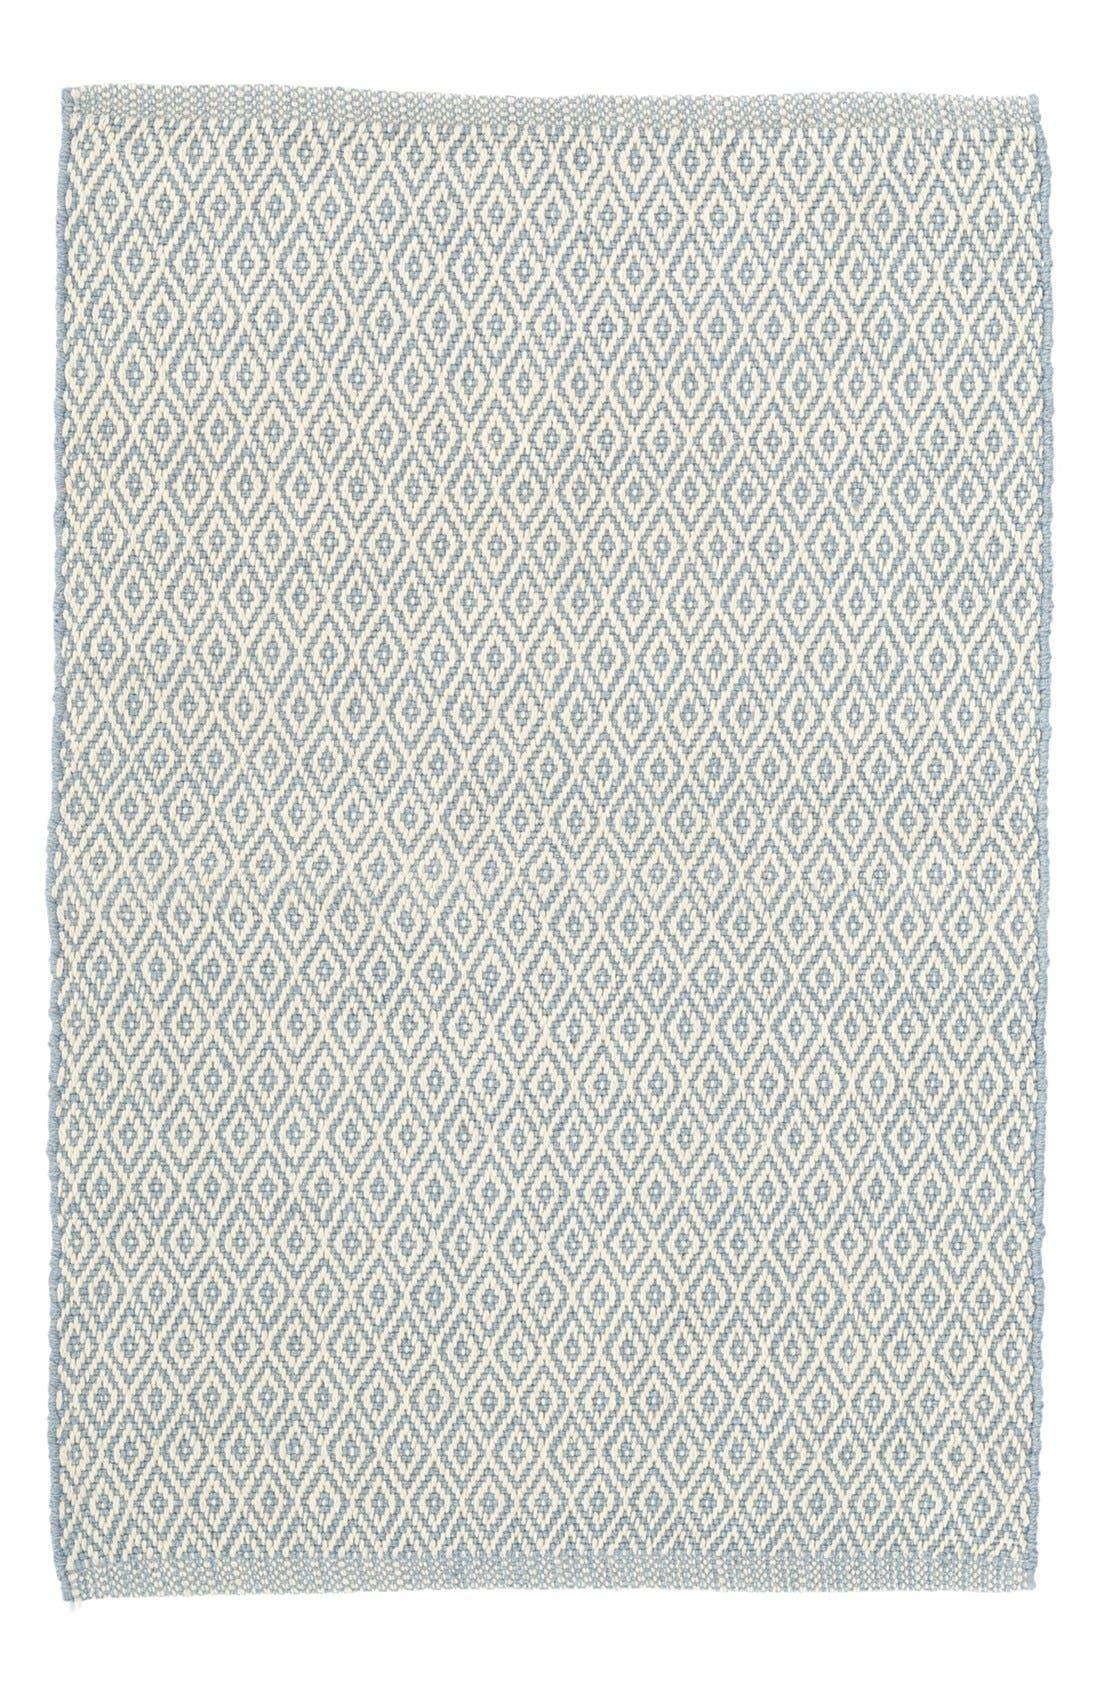 Crystal Swedish Handwoven Rug,                             Main thumbnail 1, color,                             400